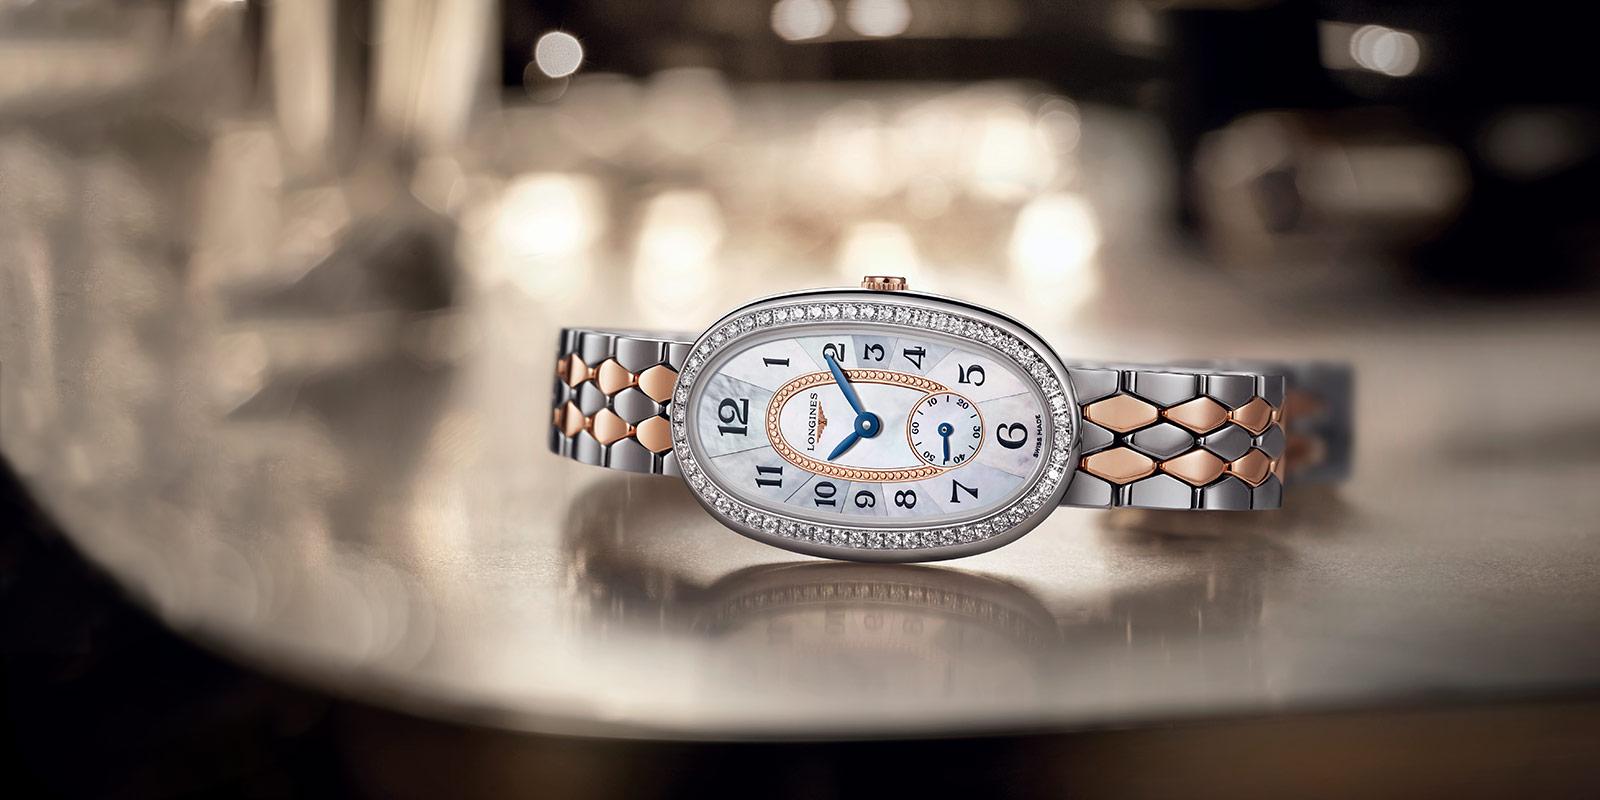 đồng hồ Longines Symphonette phiên bản 2017